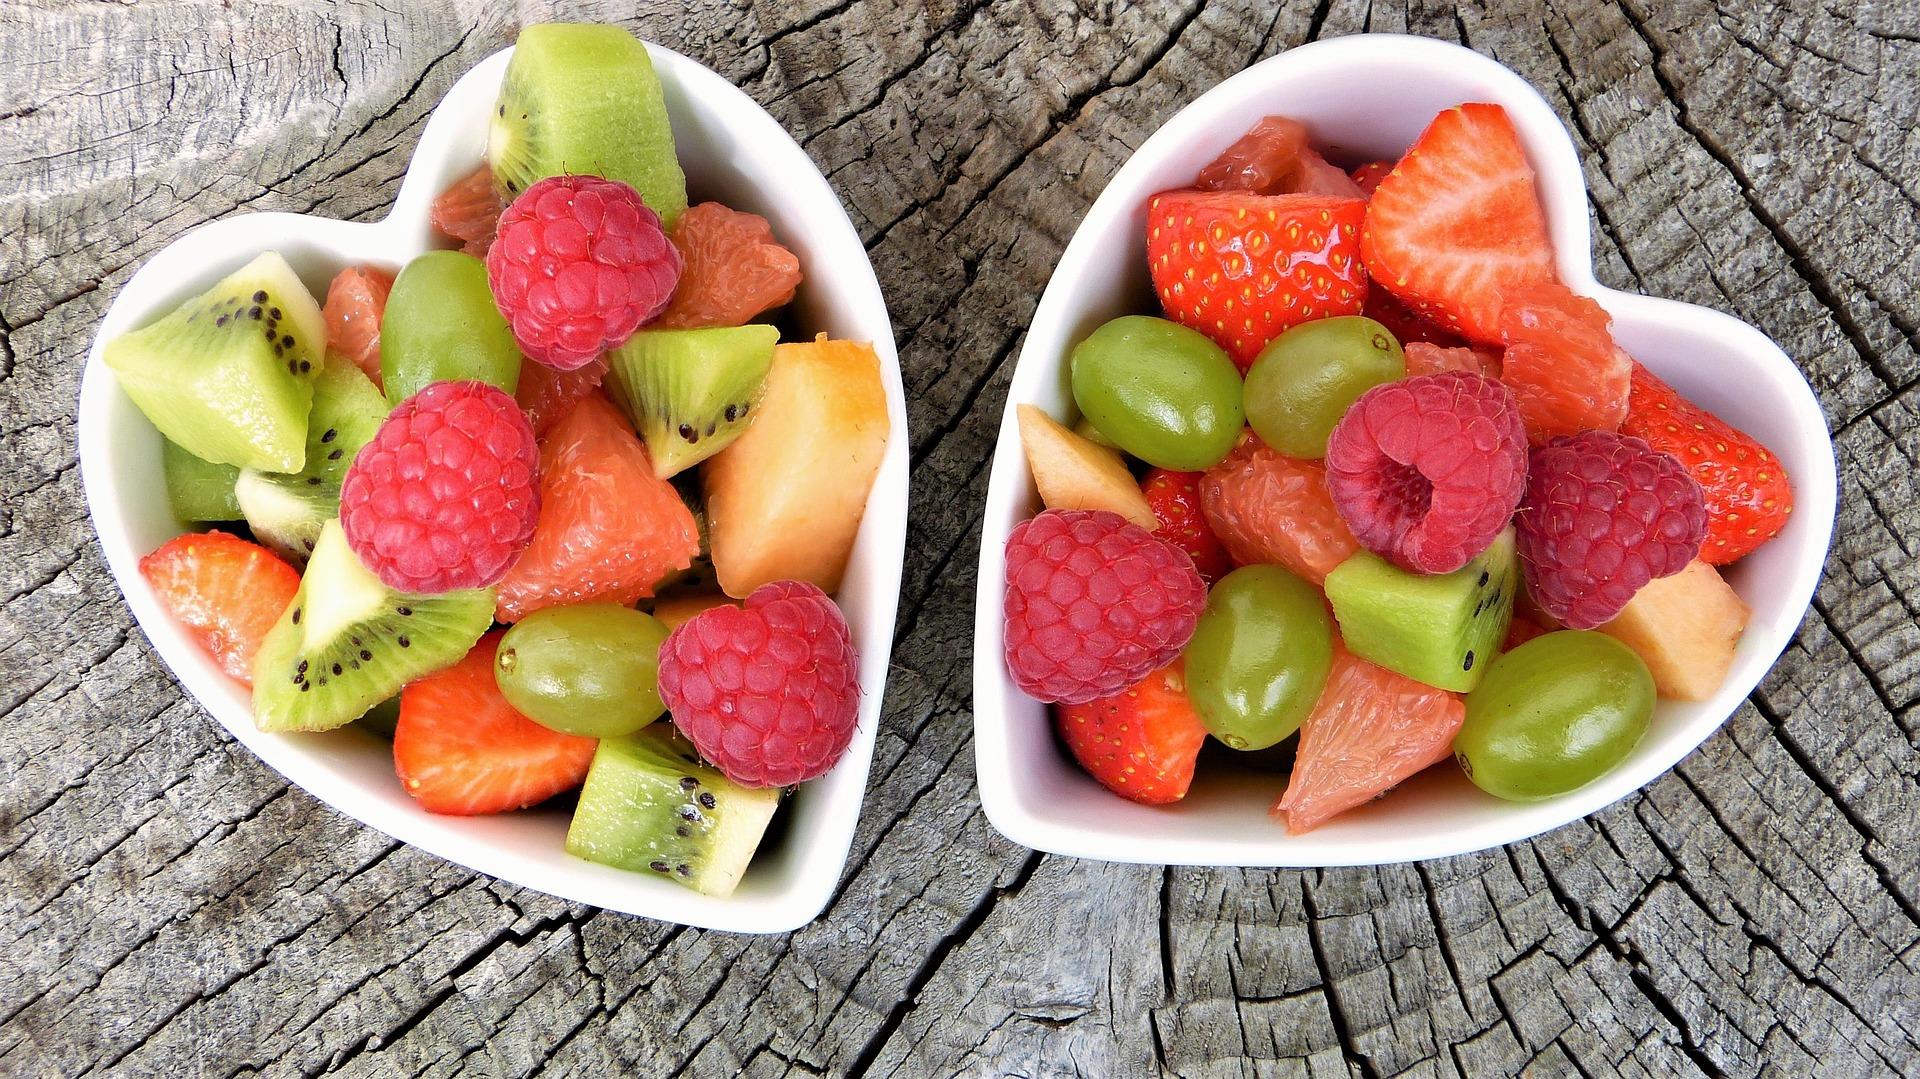 fruit 2305192 1920